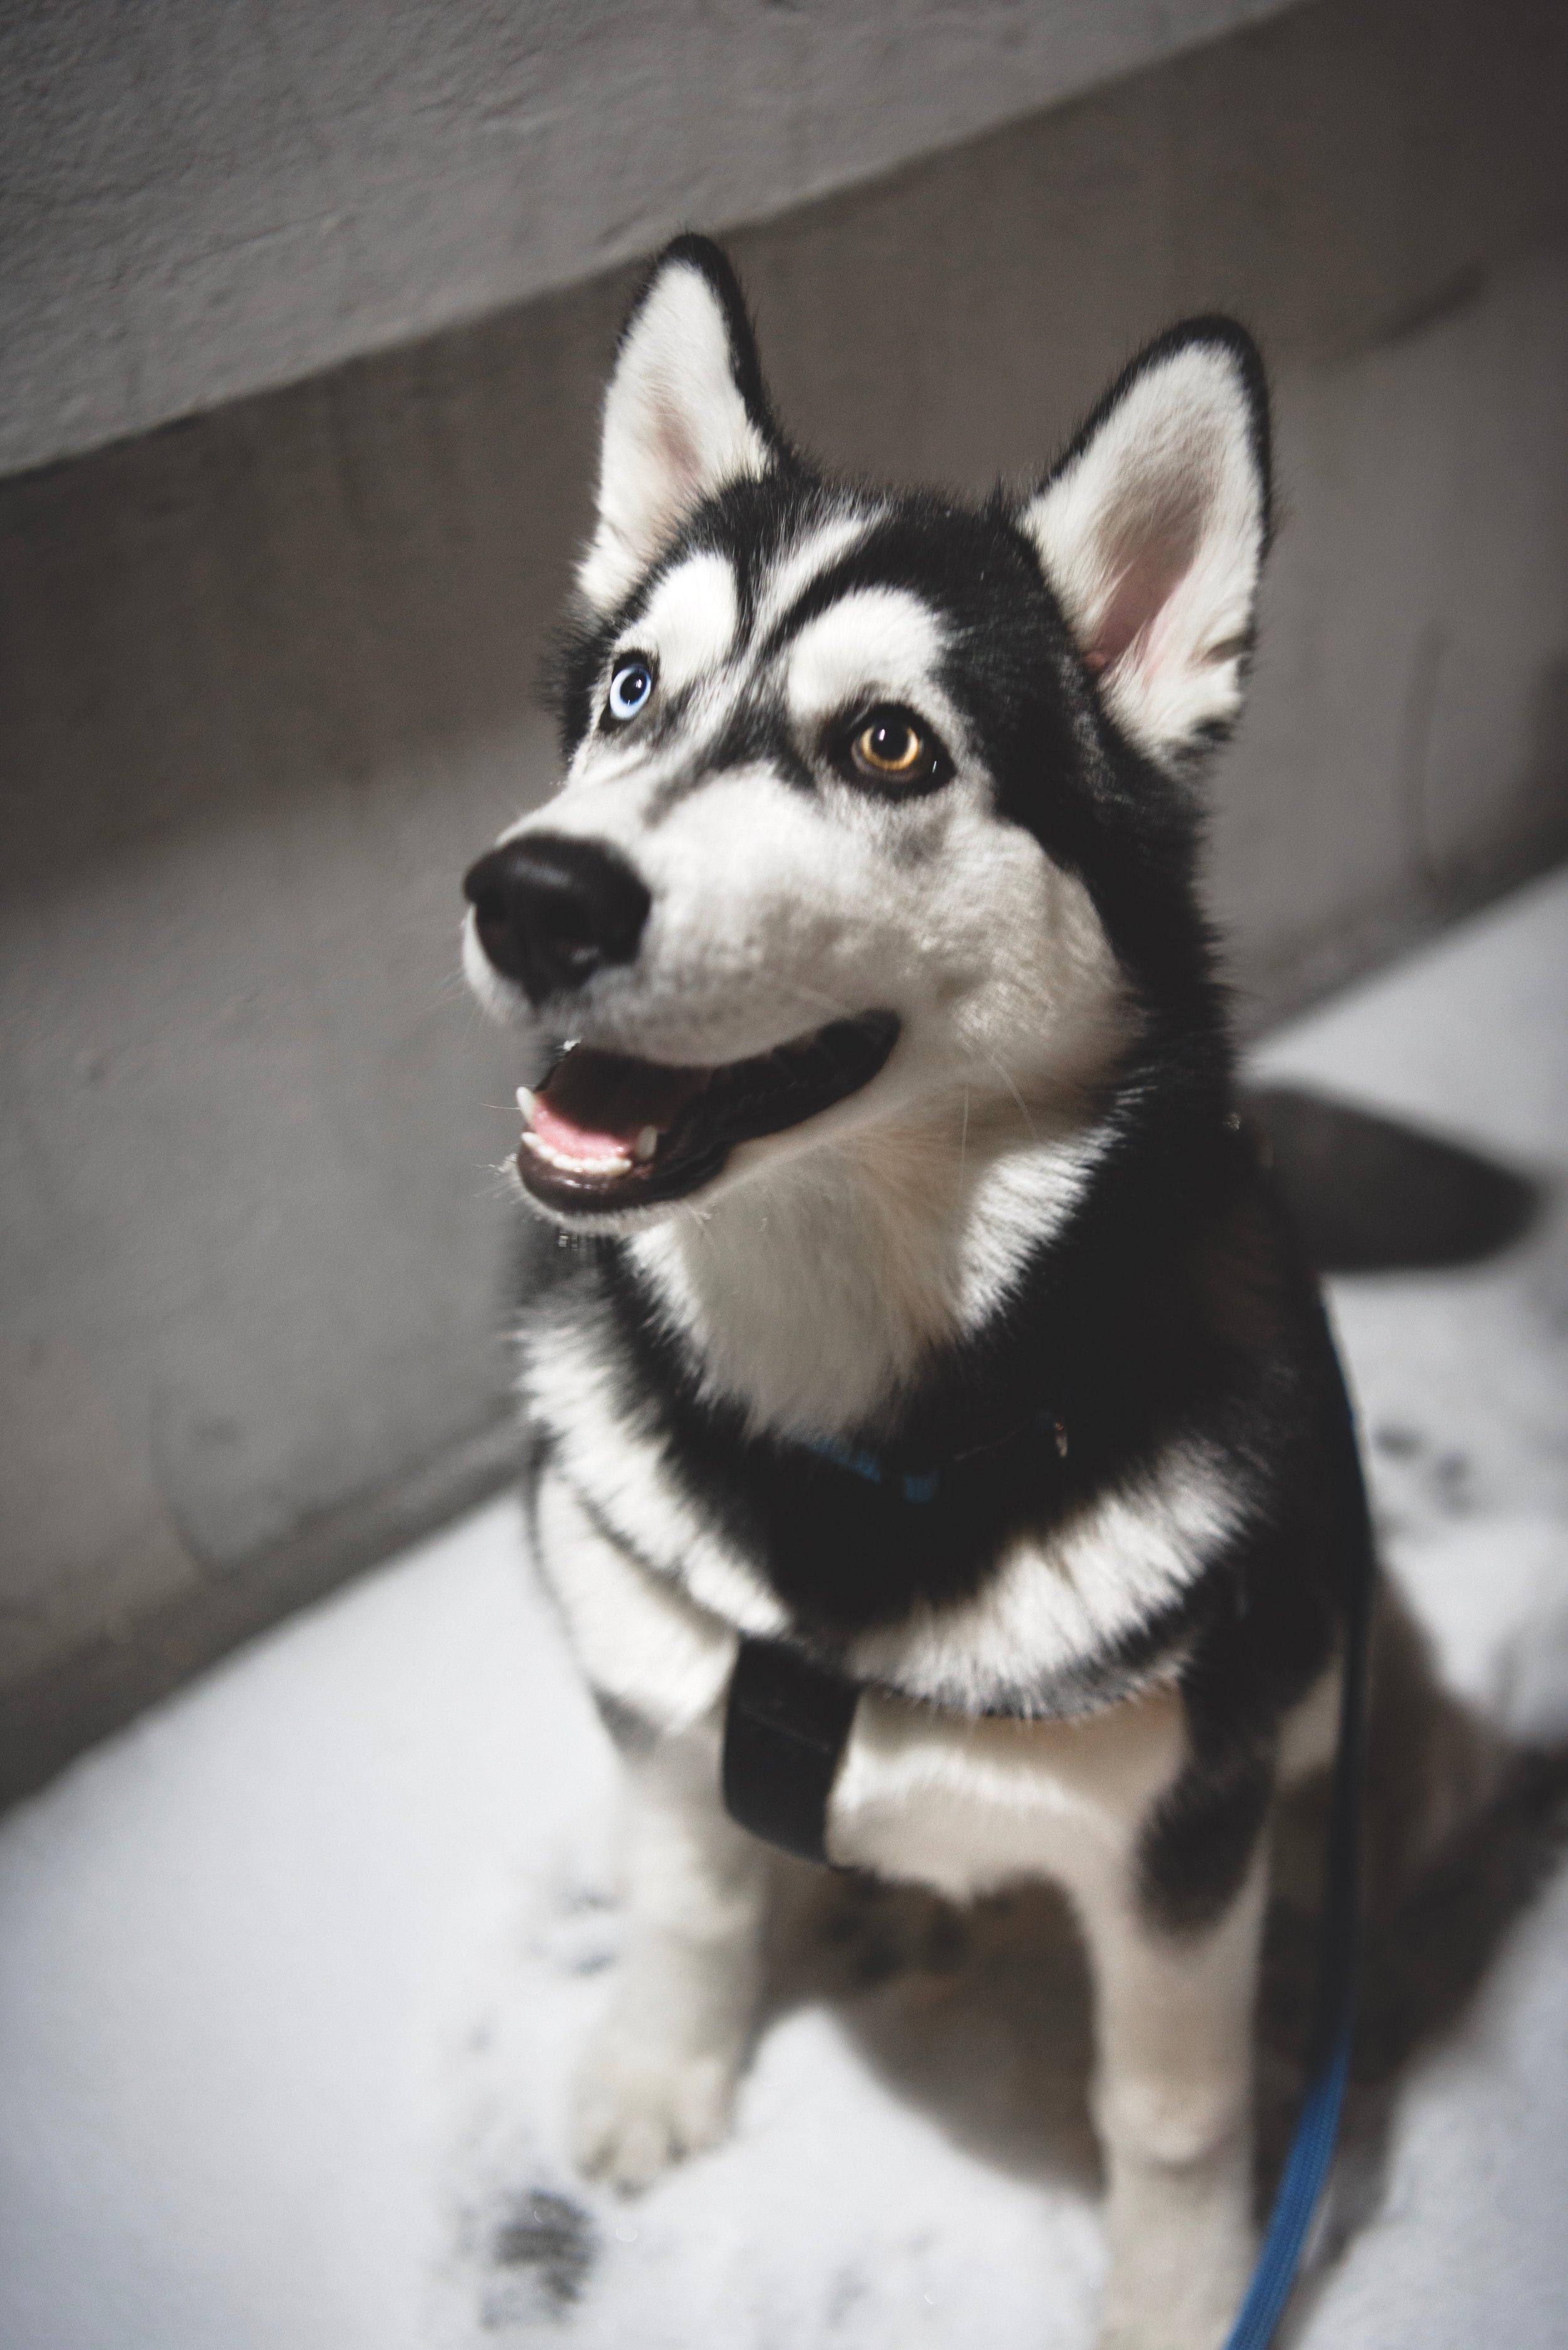 animal-blur-canine-803766.jpg